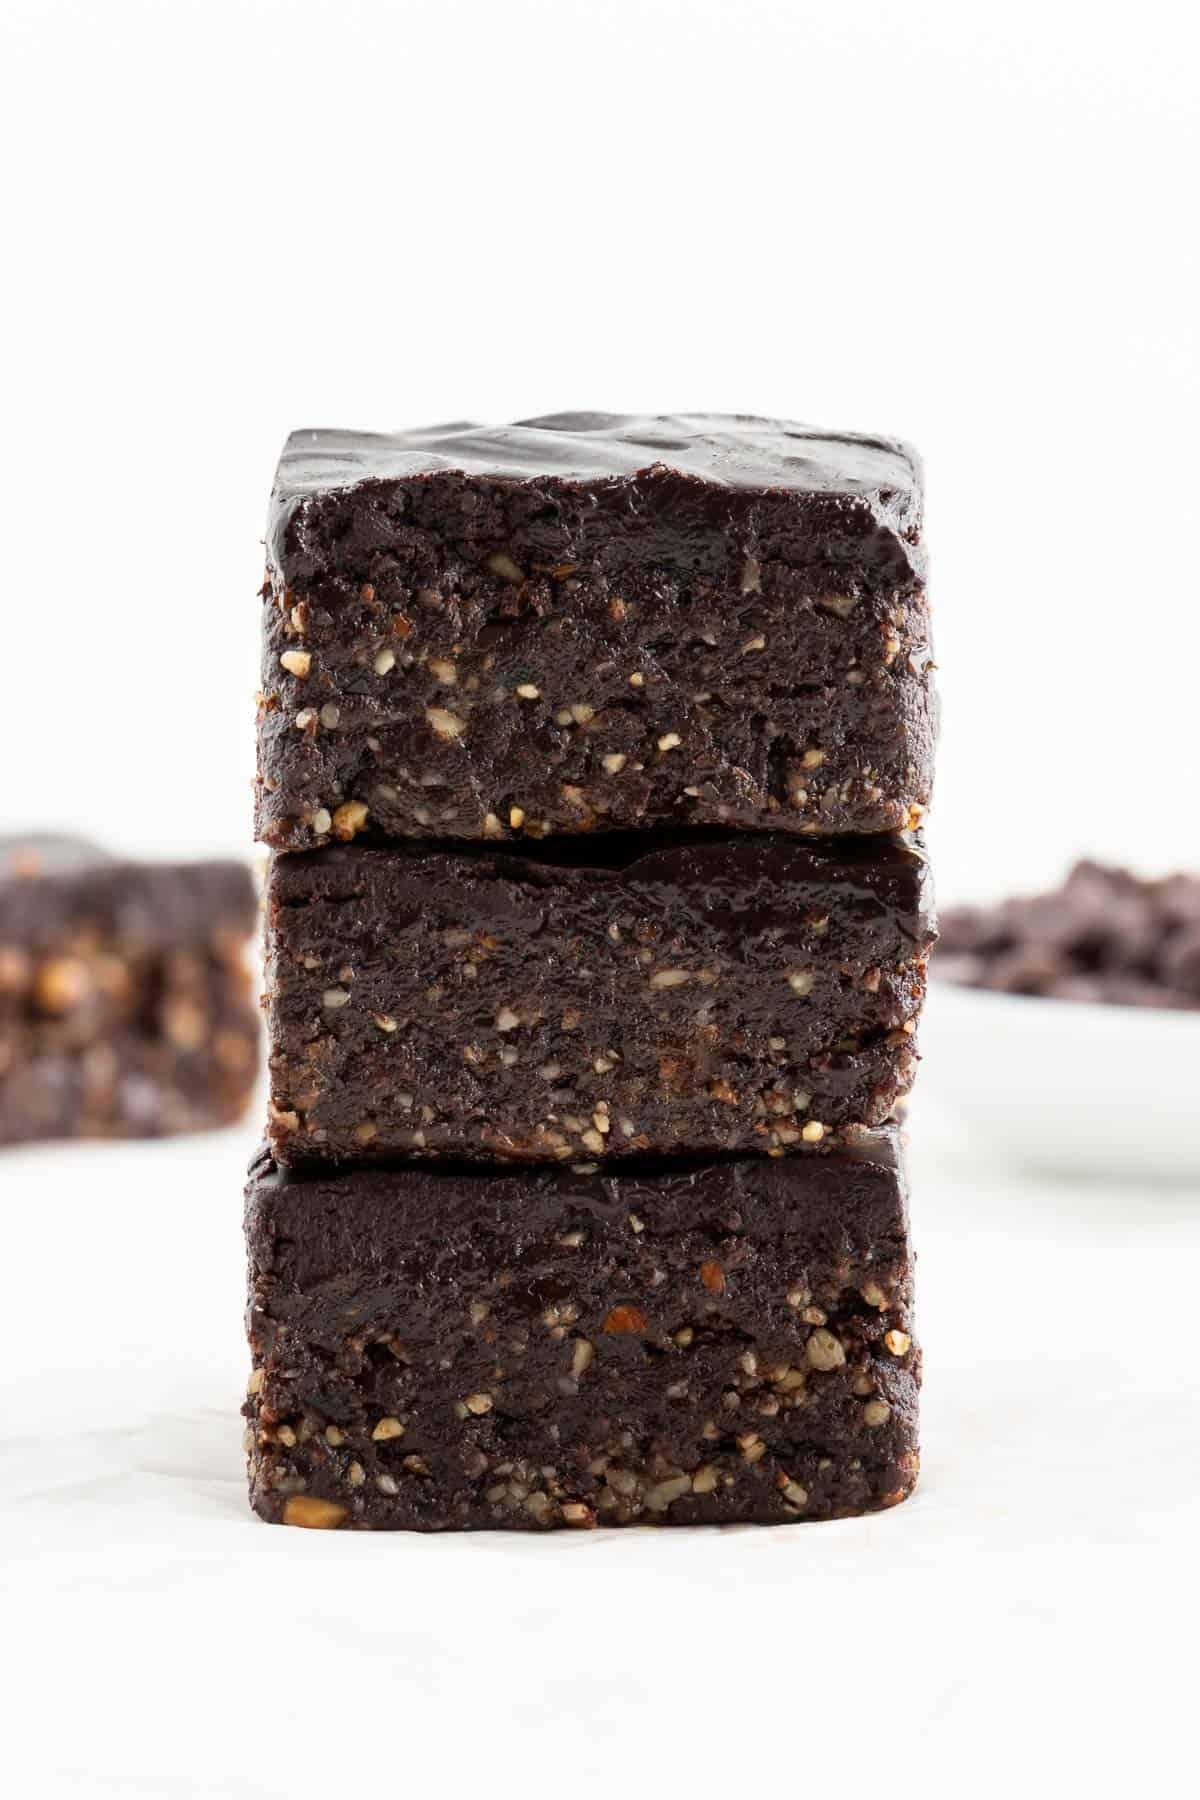 a stack of three no bake vegan brownies with chocolate ganache